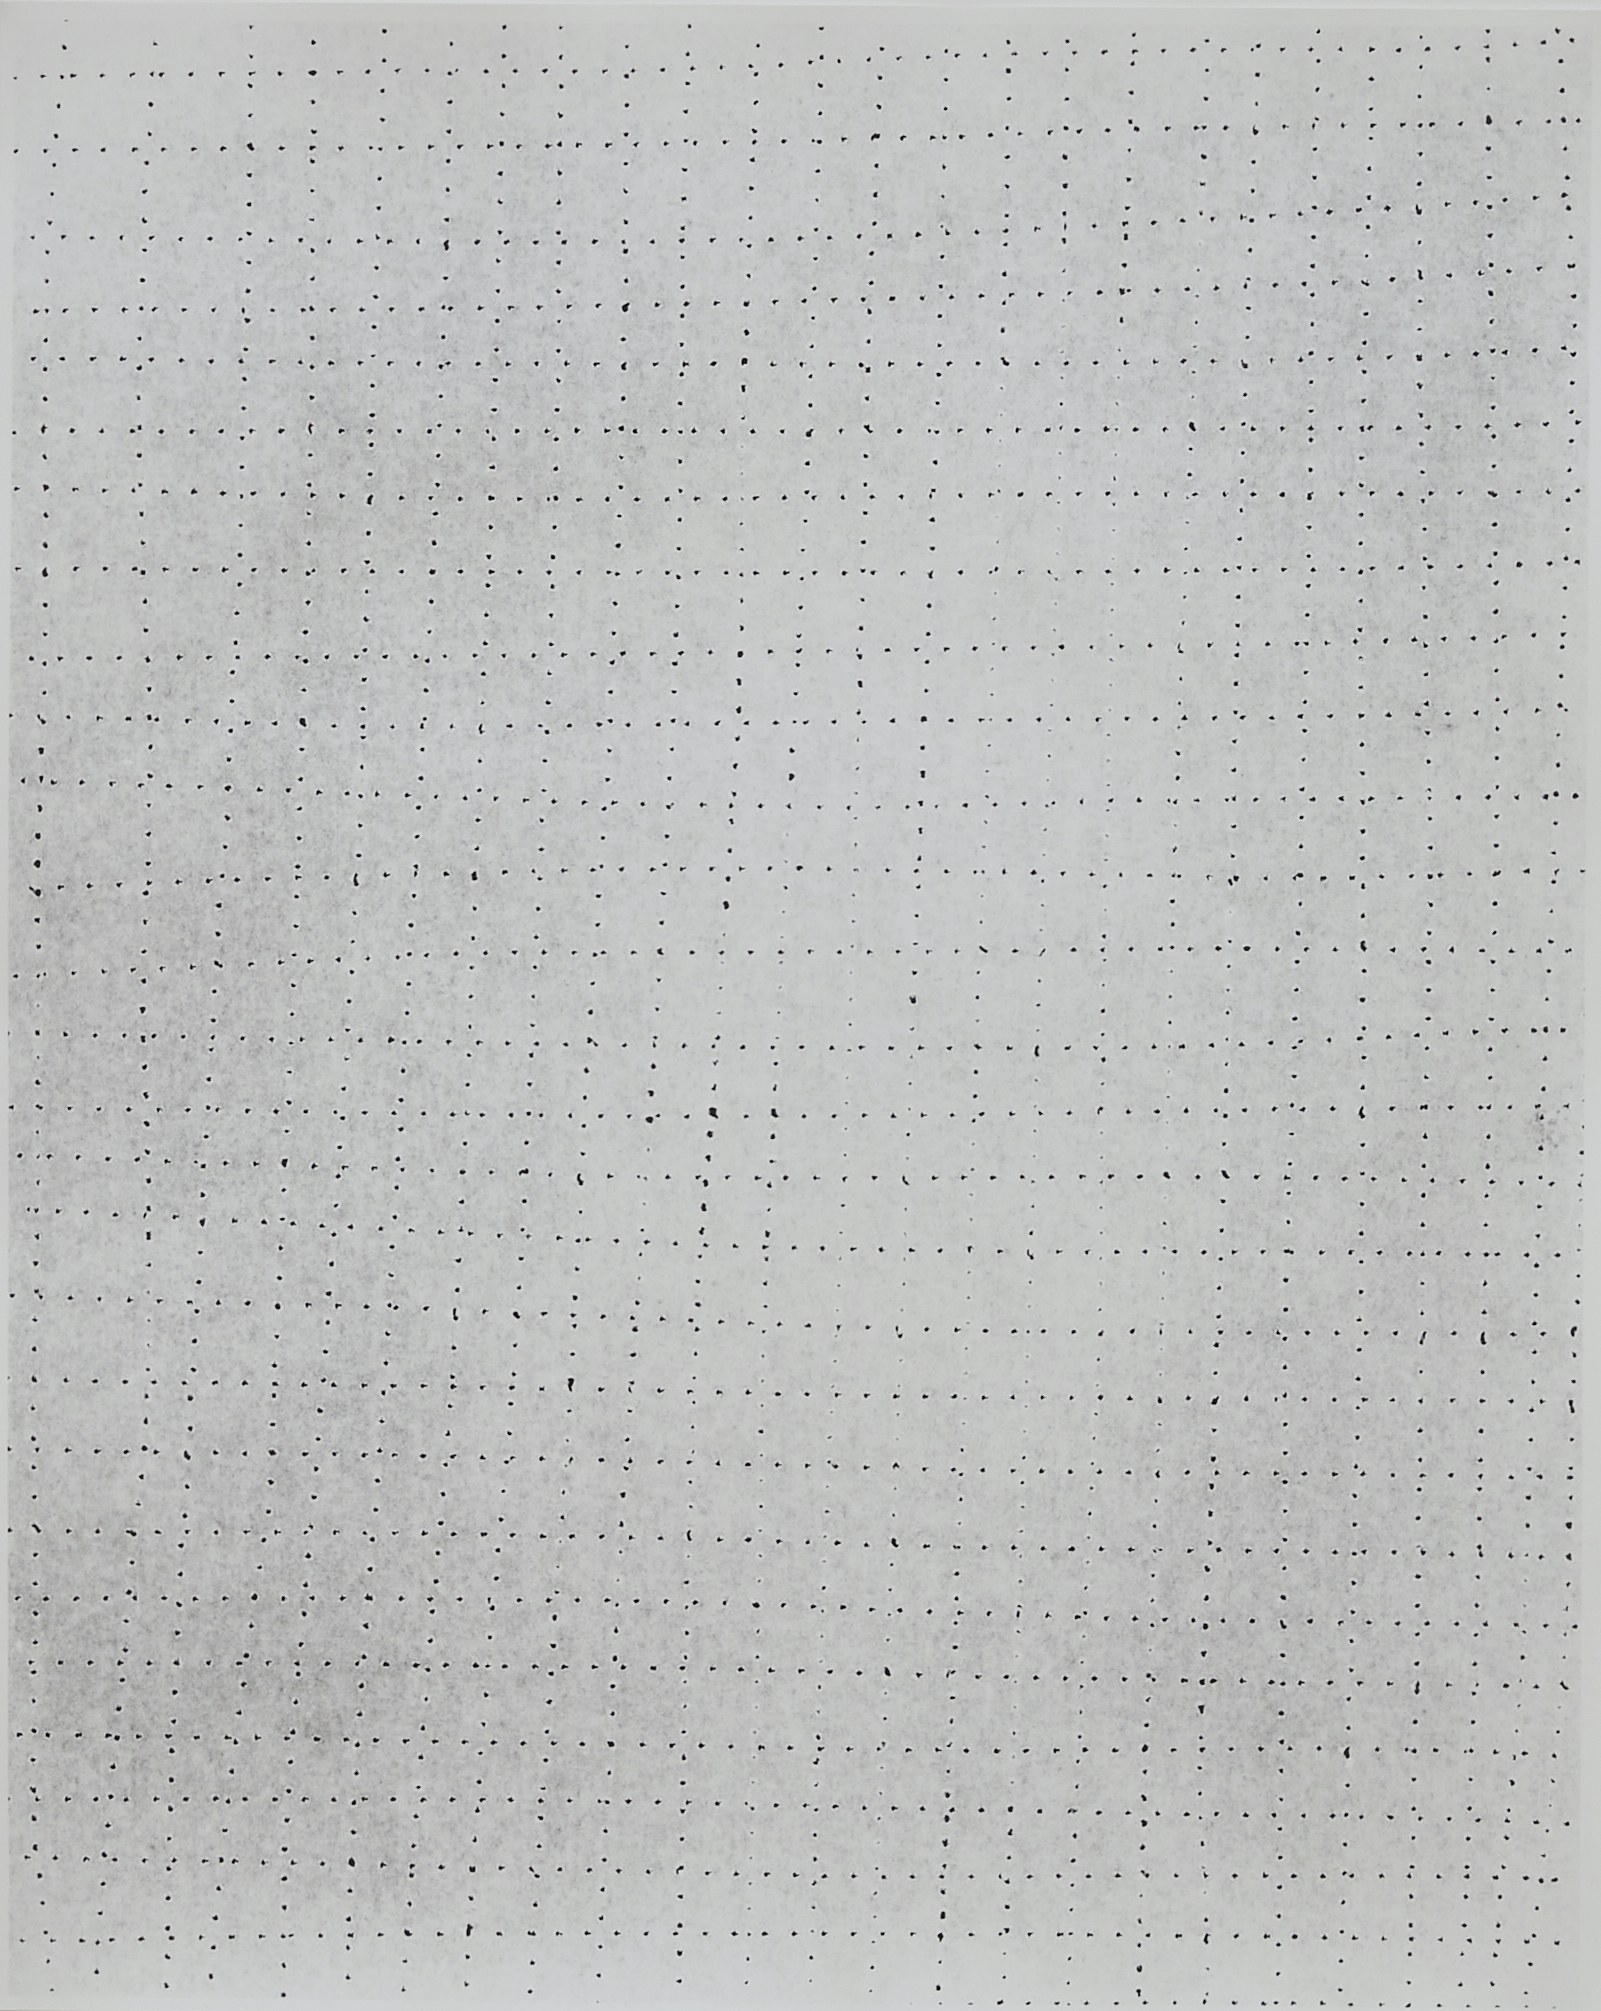 Practice Piece (Sewing Excerise #22W), 2019, Silver gelantin print, 53 x 40cm